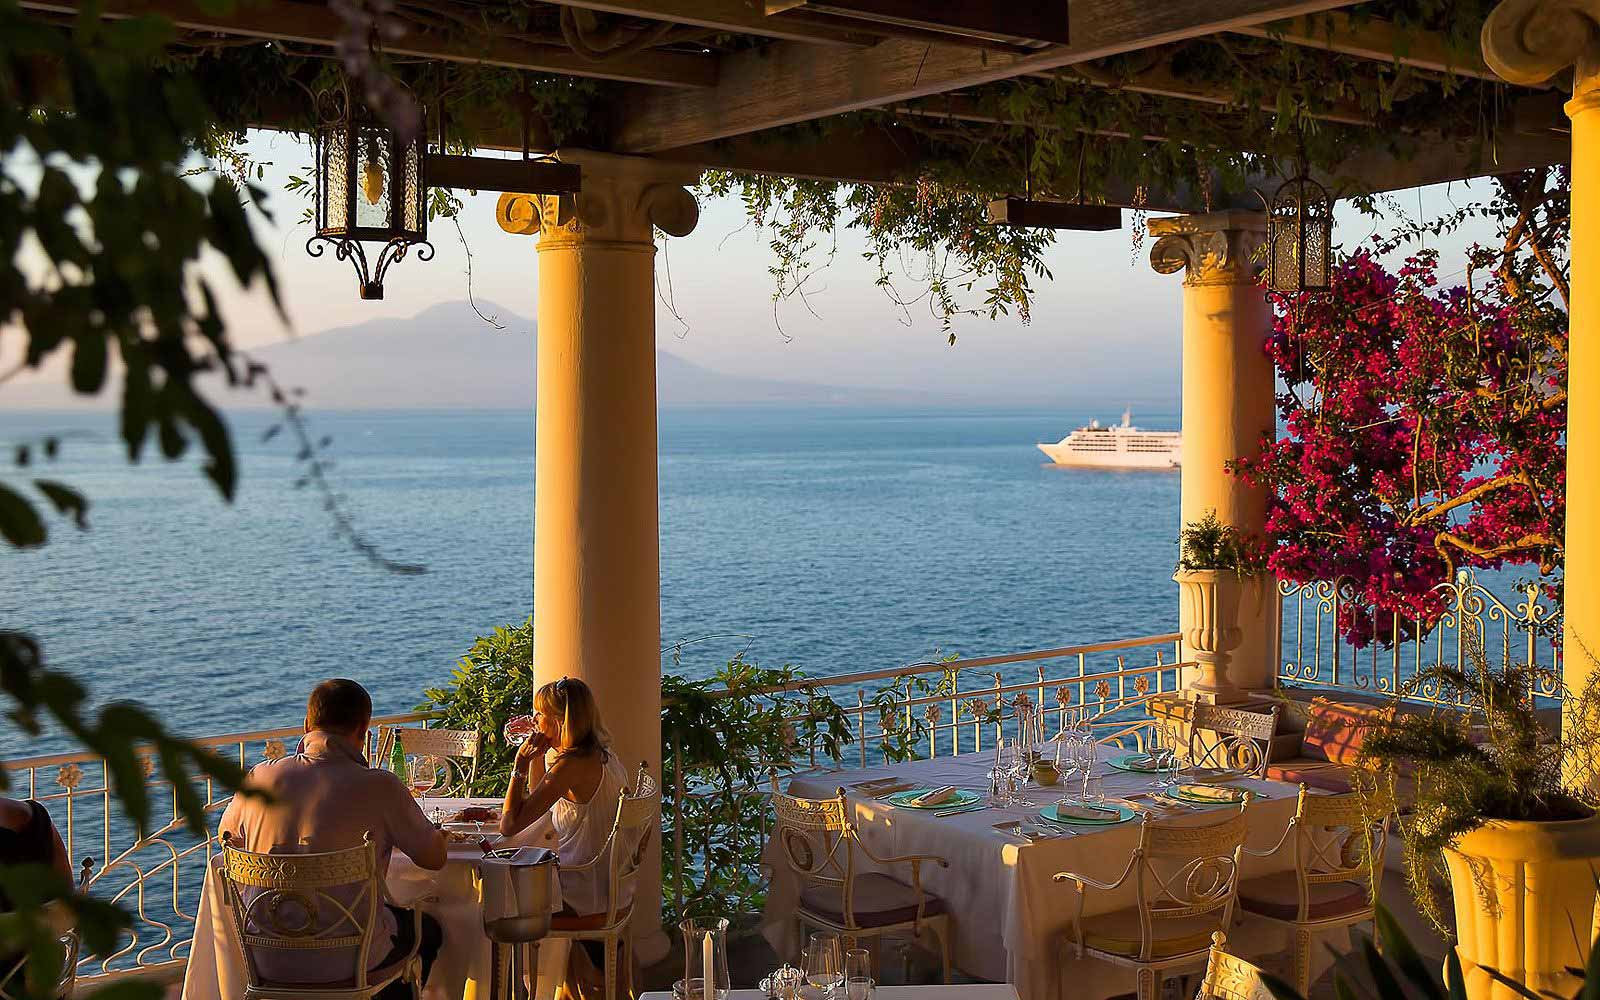 La Pergola Restaurant at Hotel Bellevue Syrene